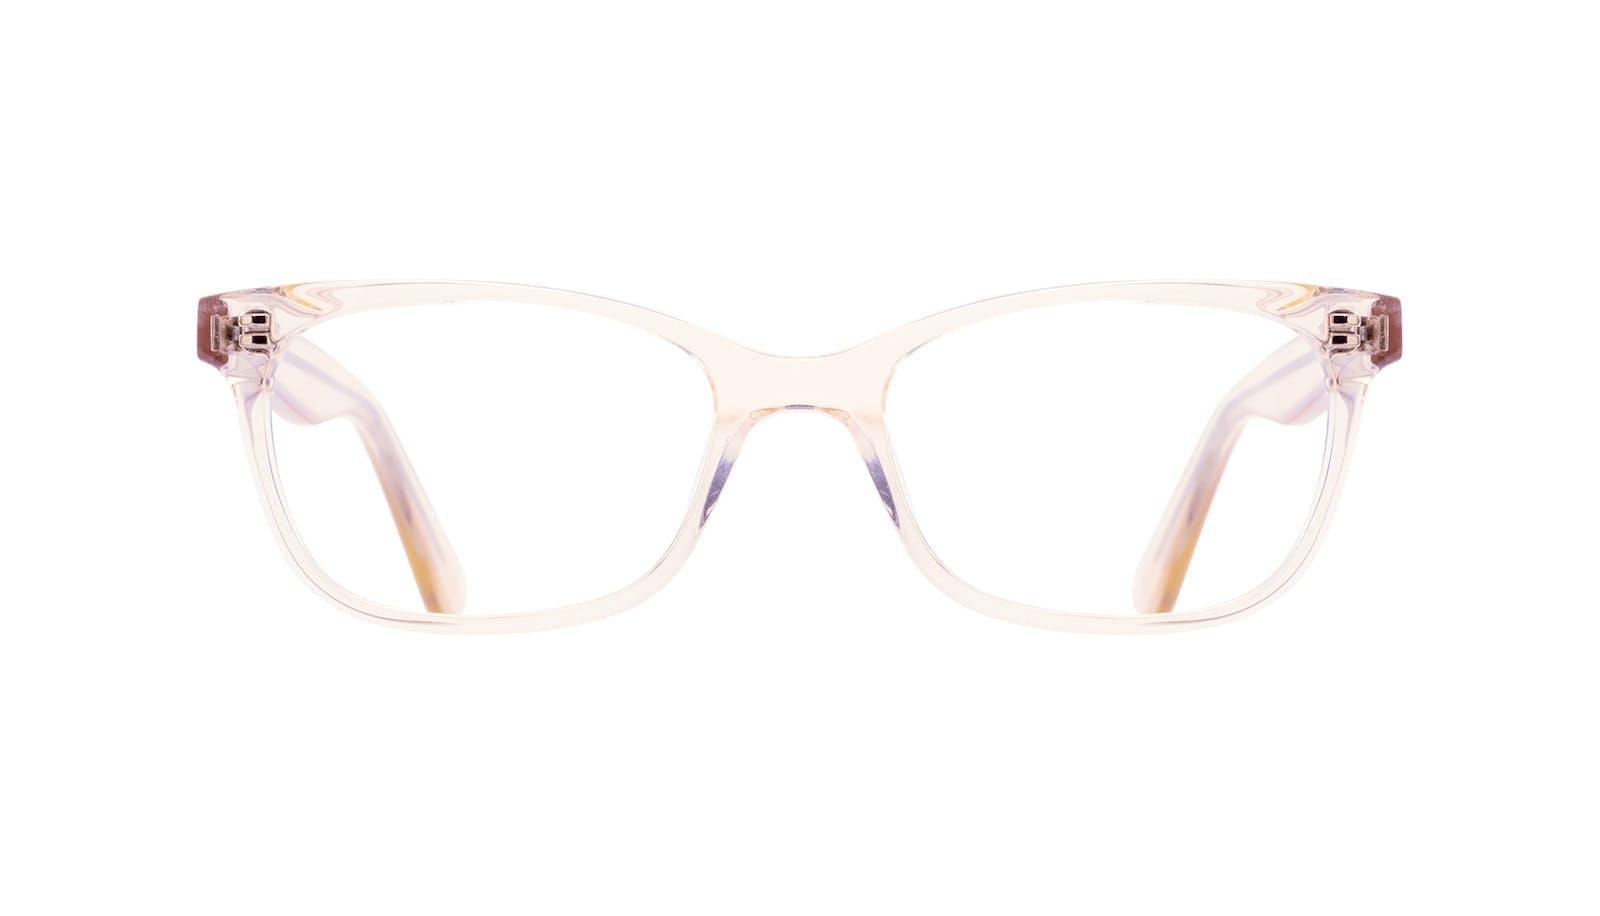 92e3e65371f0 Affordable Fashion Glasses Cat Eye Rectangle Square Eyeglasses Women Comet  Blond